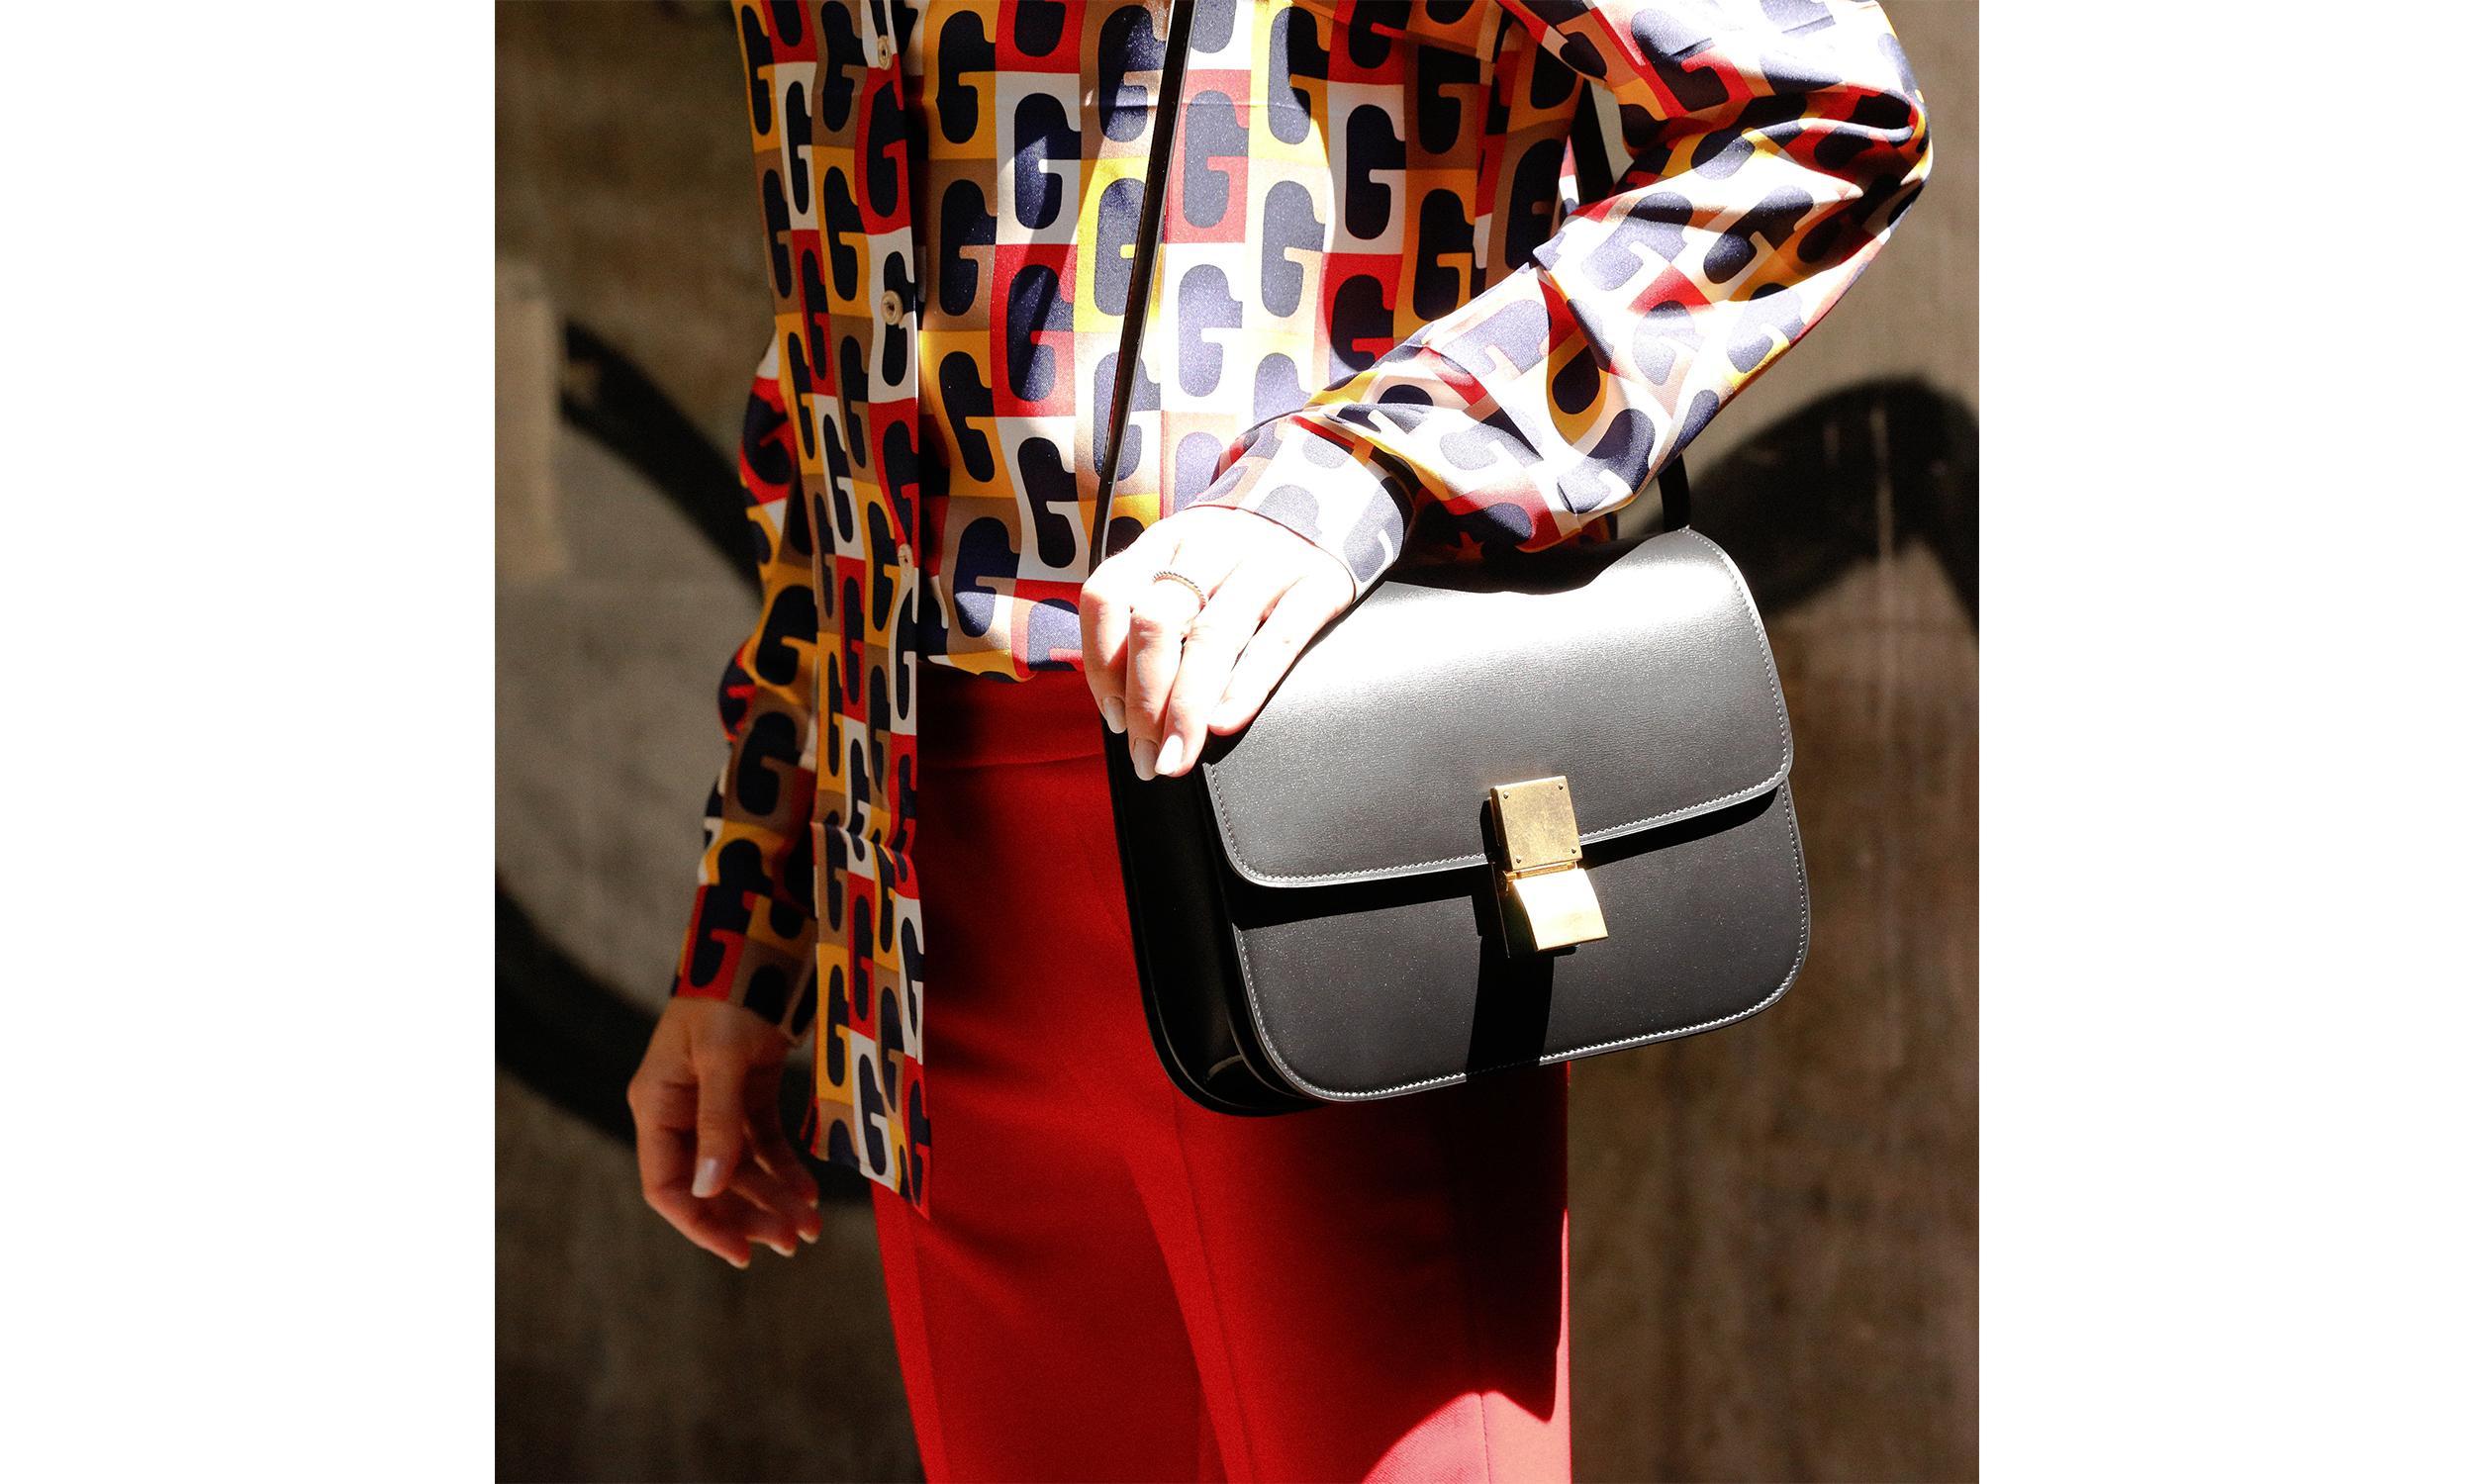 emerson-renaldi-work-wear-gucci-celine-box-bag.jpg